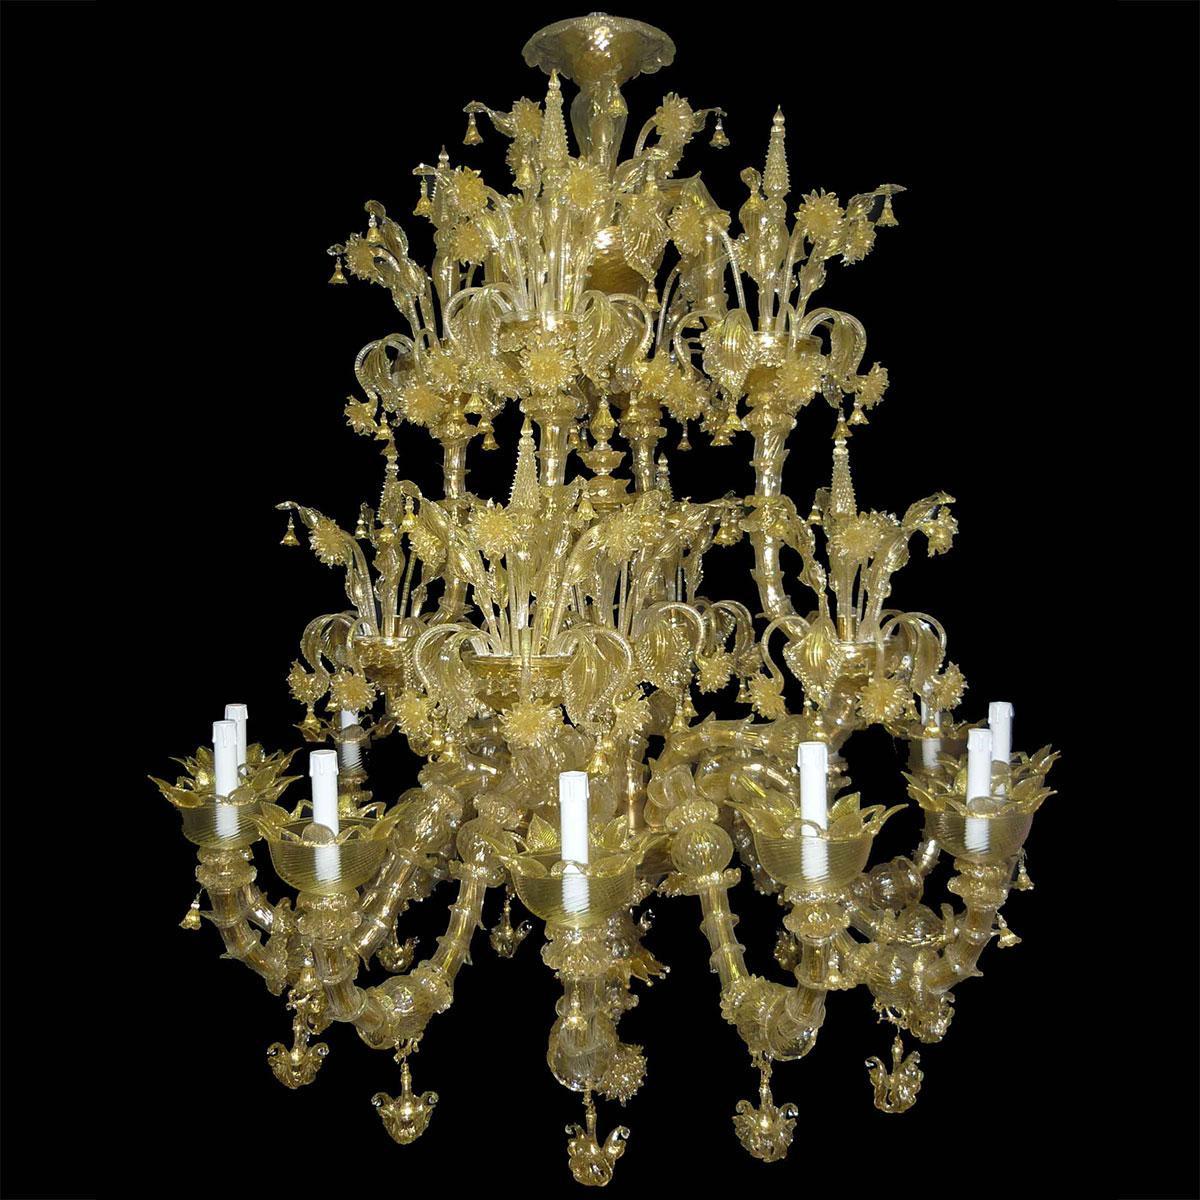 """Adelchi"" Murano glass chandelier - 12 lights - gold"